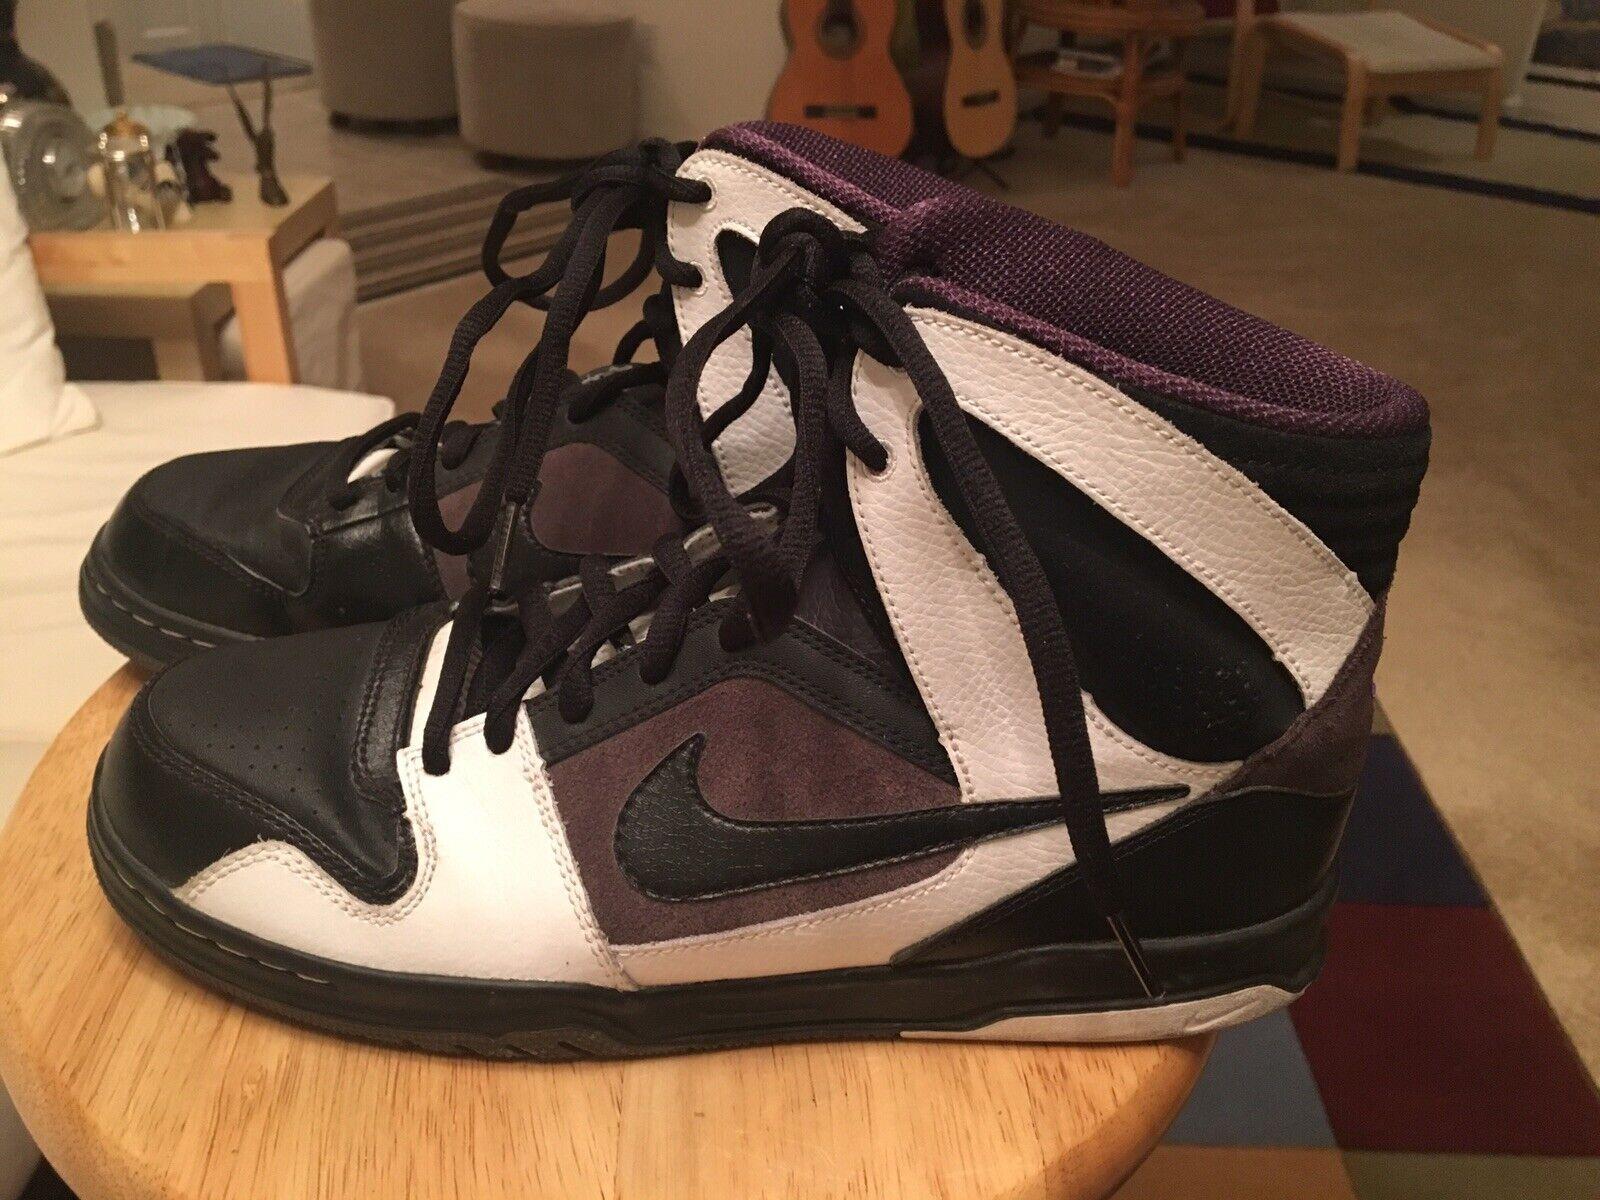 Nike Oncore 6.0 Black/White/Purple Men's US9 Leather Hi-Top Sneakers Shoes